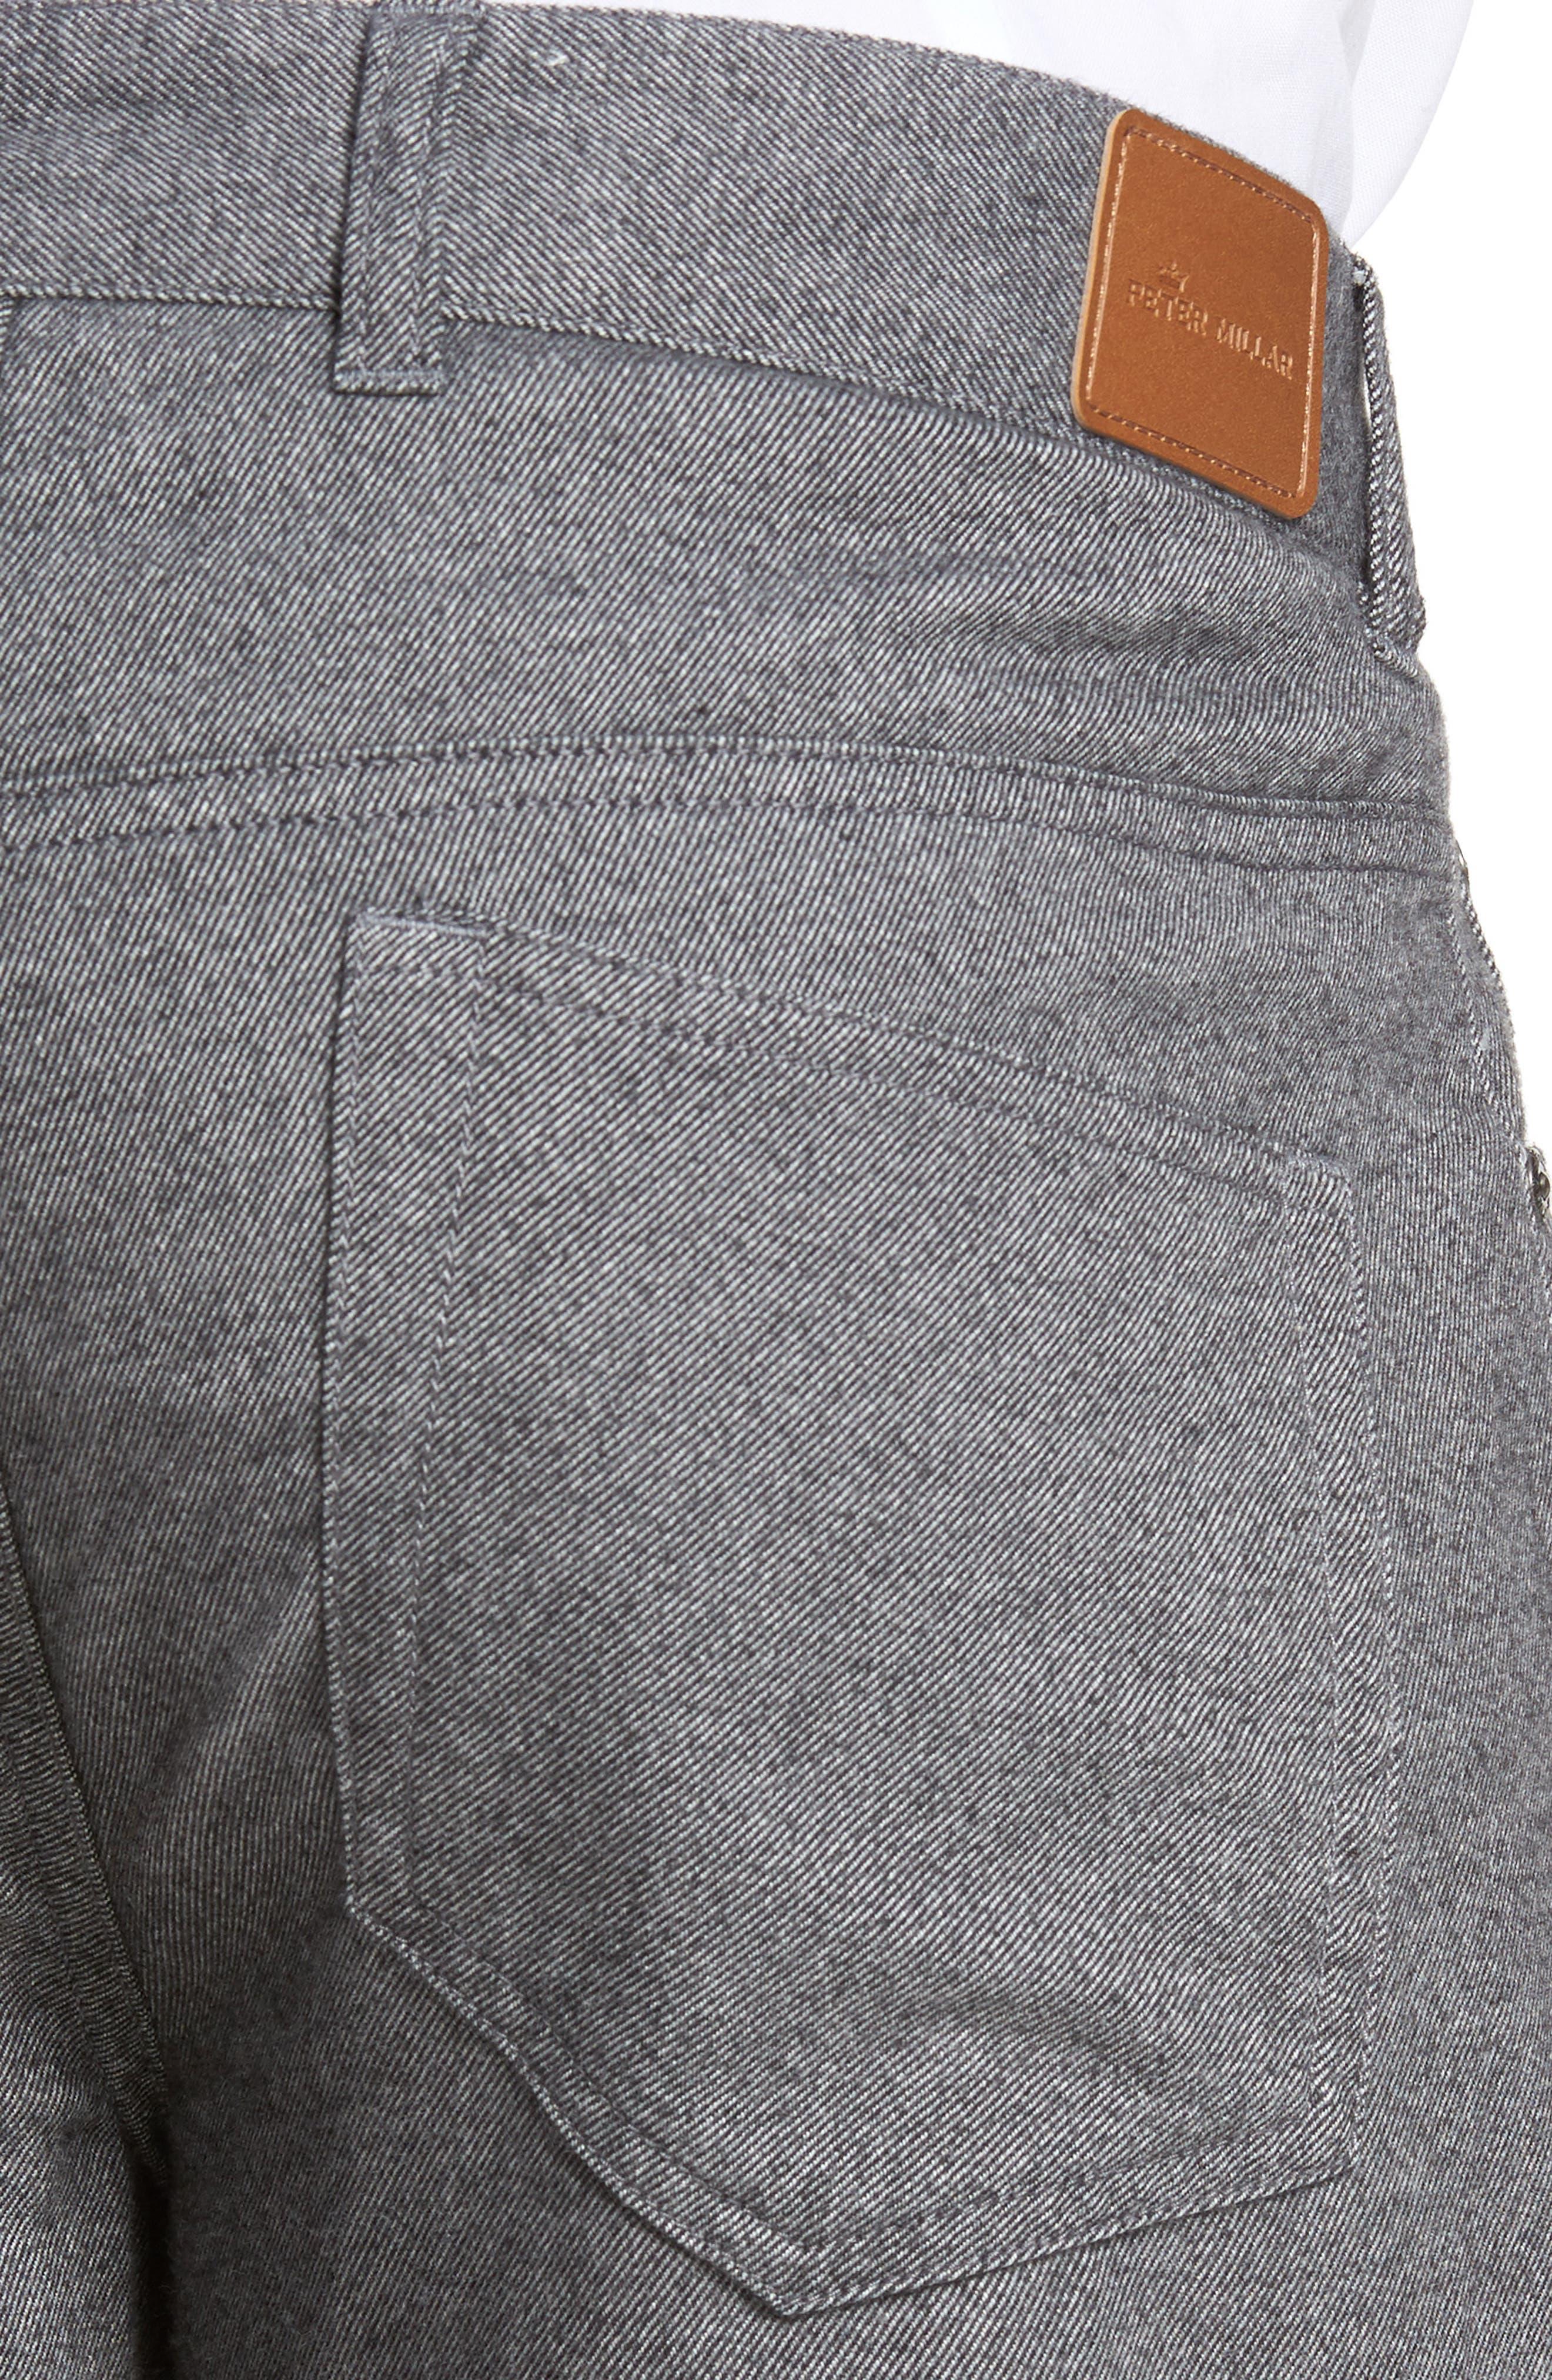 Mountainside Flannel Five-Pocket Pants,                             Alternate thumbnail 4, color,                             033